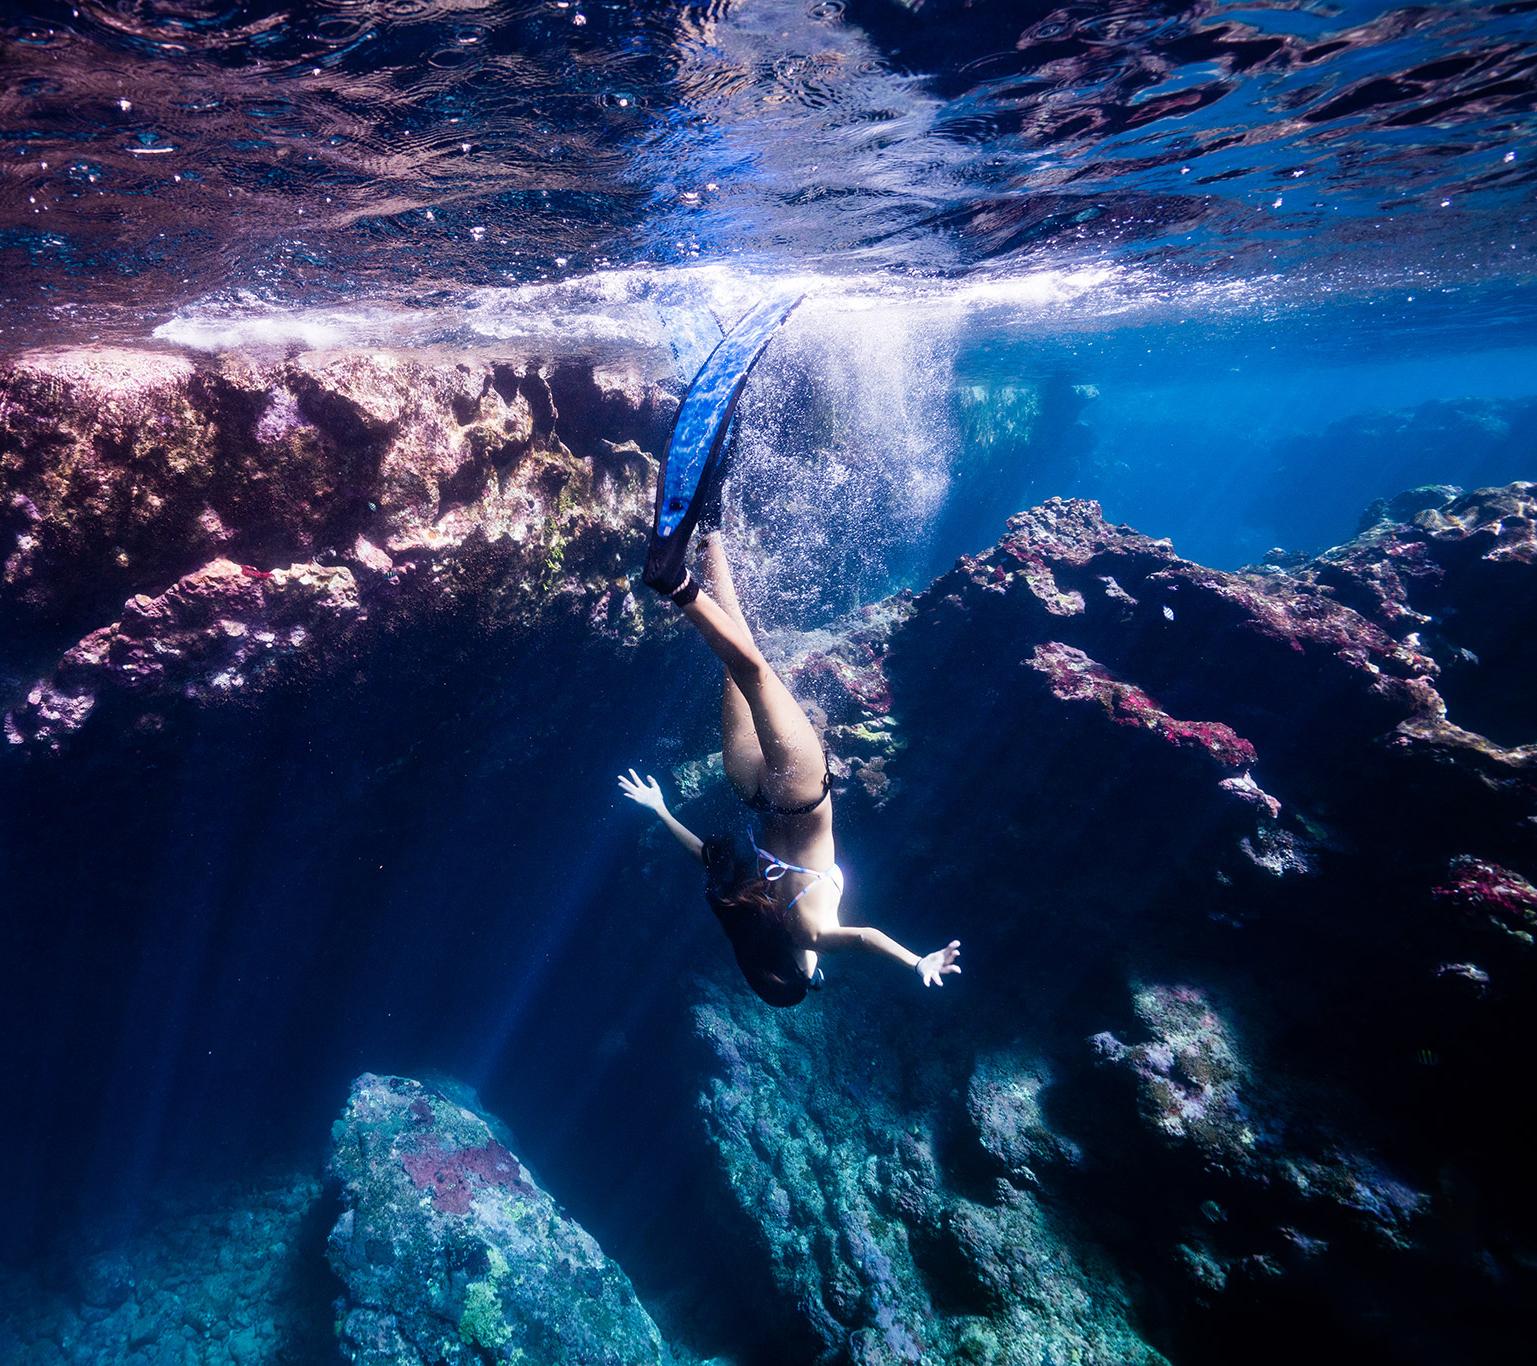 FREEDIVE 國際自由潛水AIDA2證照課程